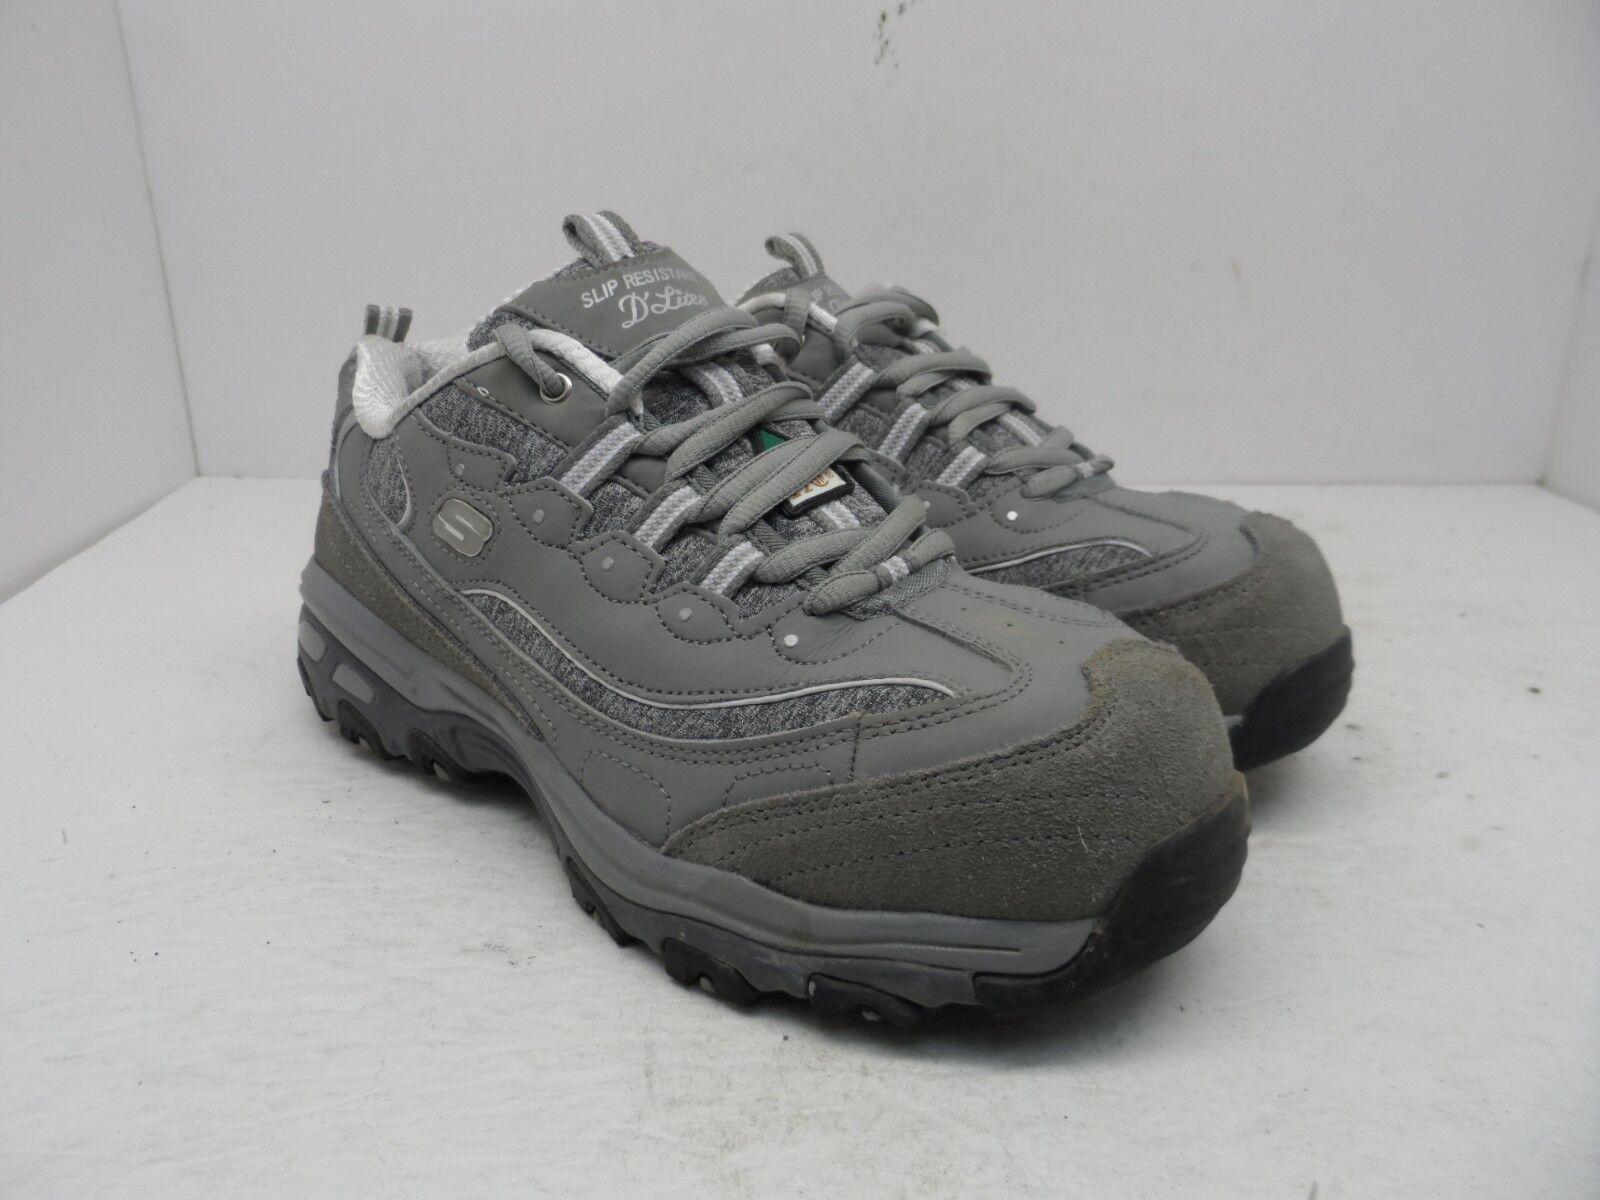 SKECHERS Women's Aluminum Toe Steel Plate Work Athletic Slip Resistant Shoe 7M